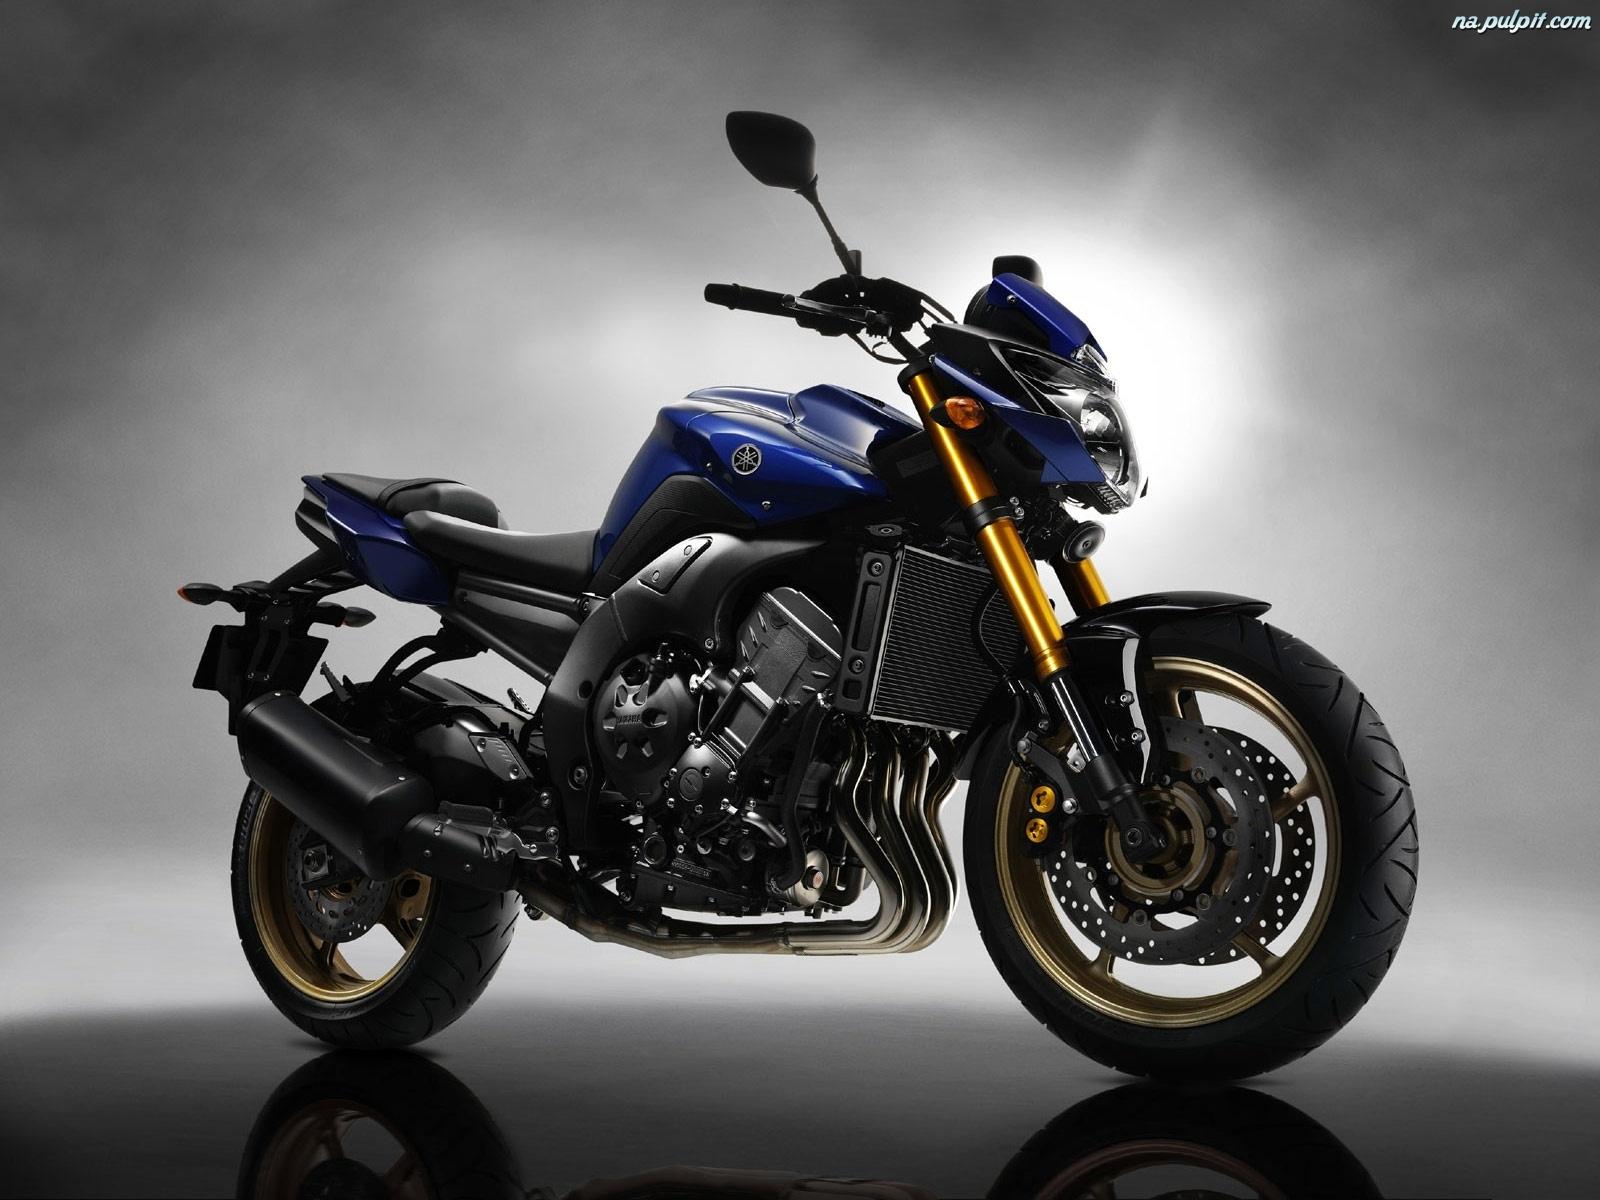 2011 yamaha fz8 motorcycle service manual ebook